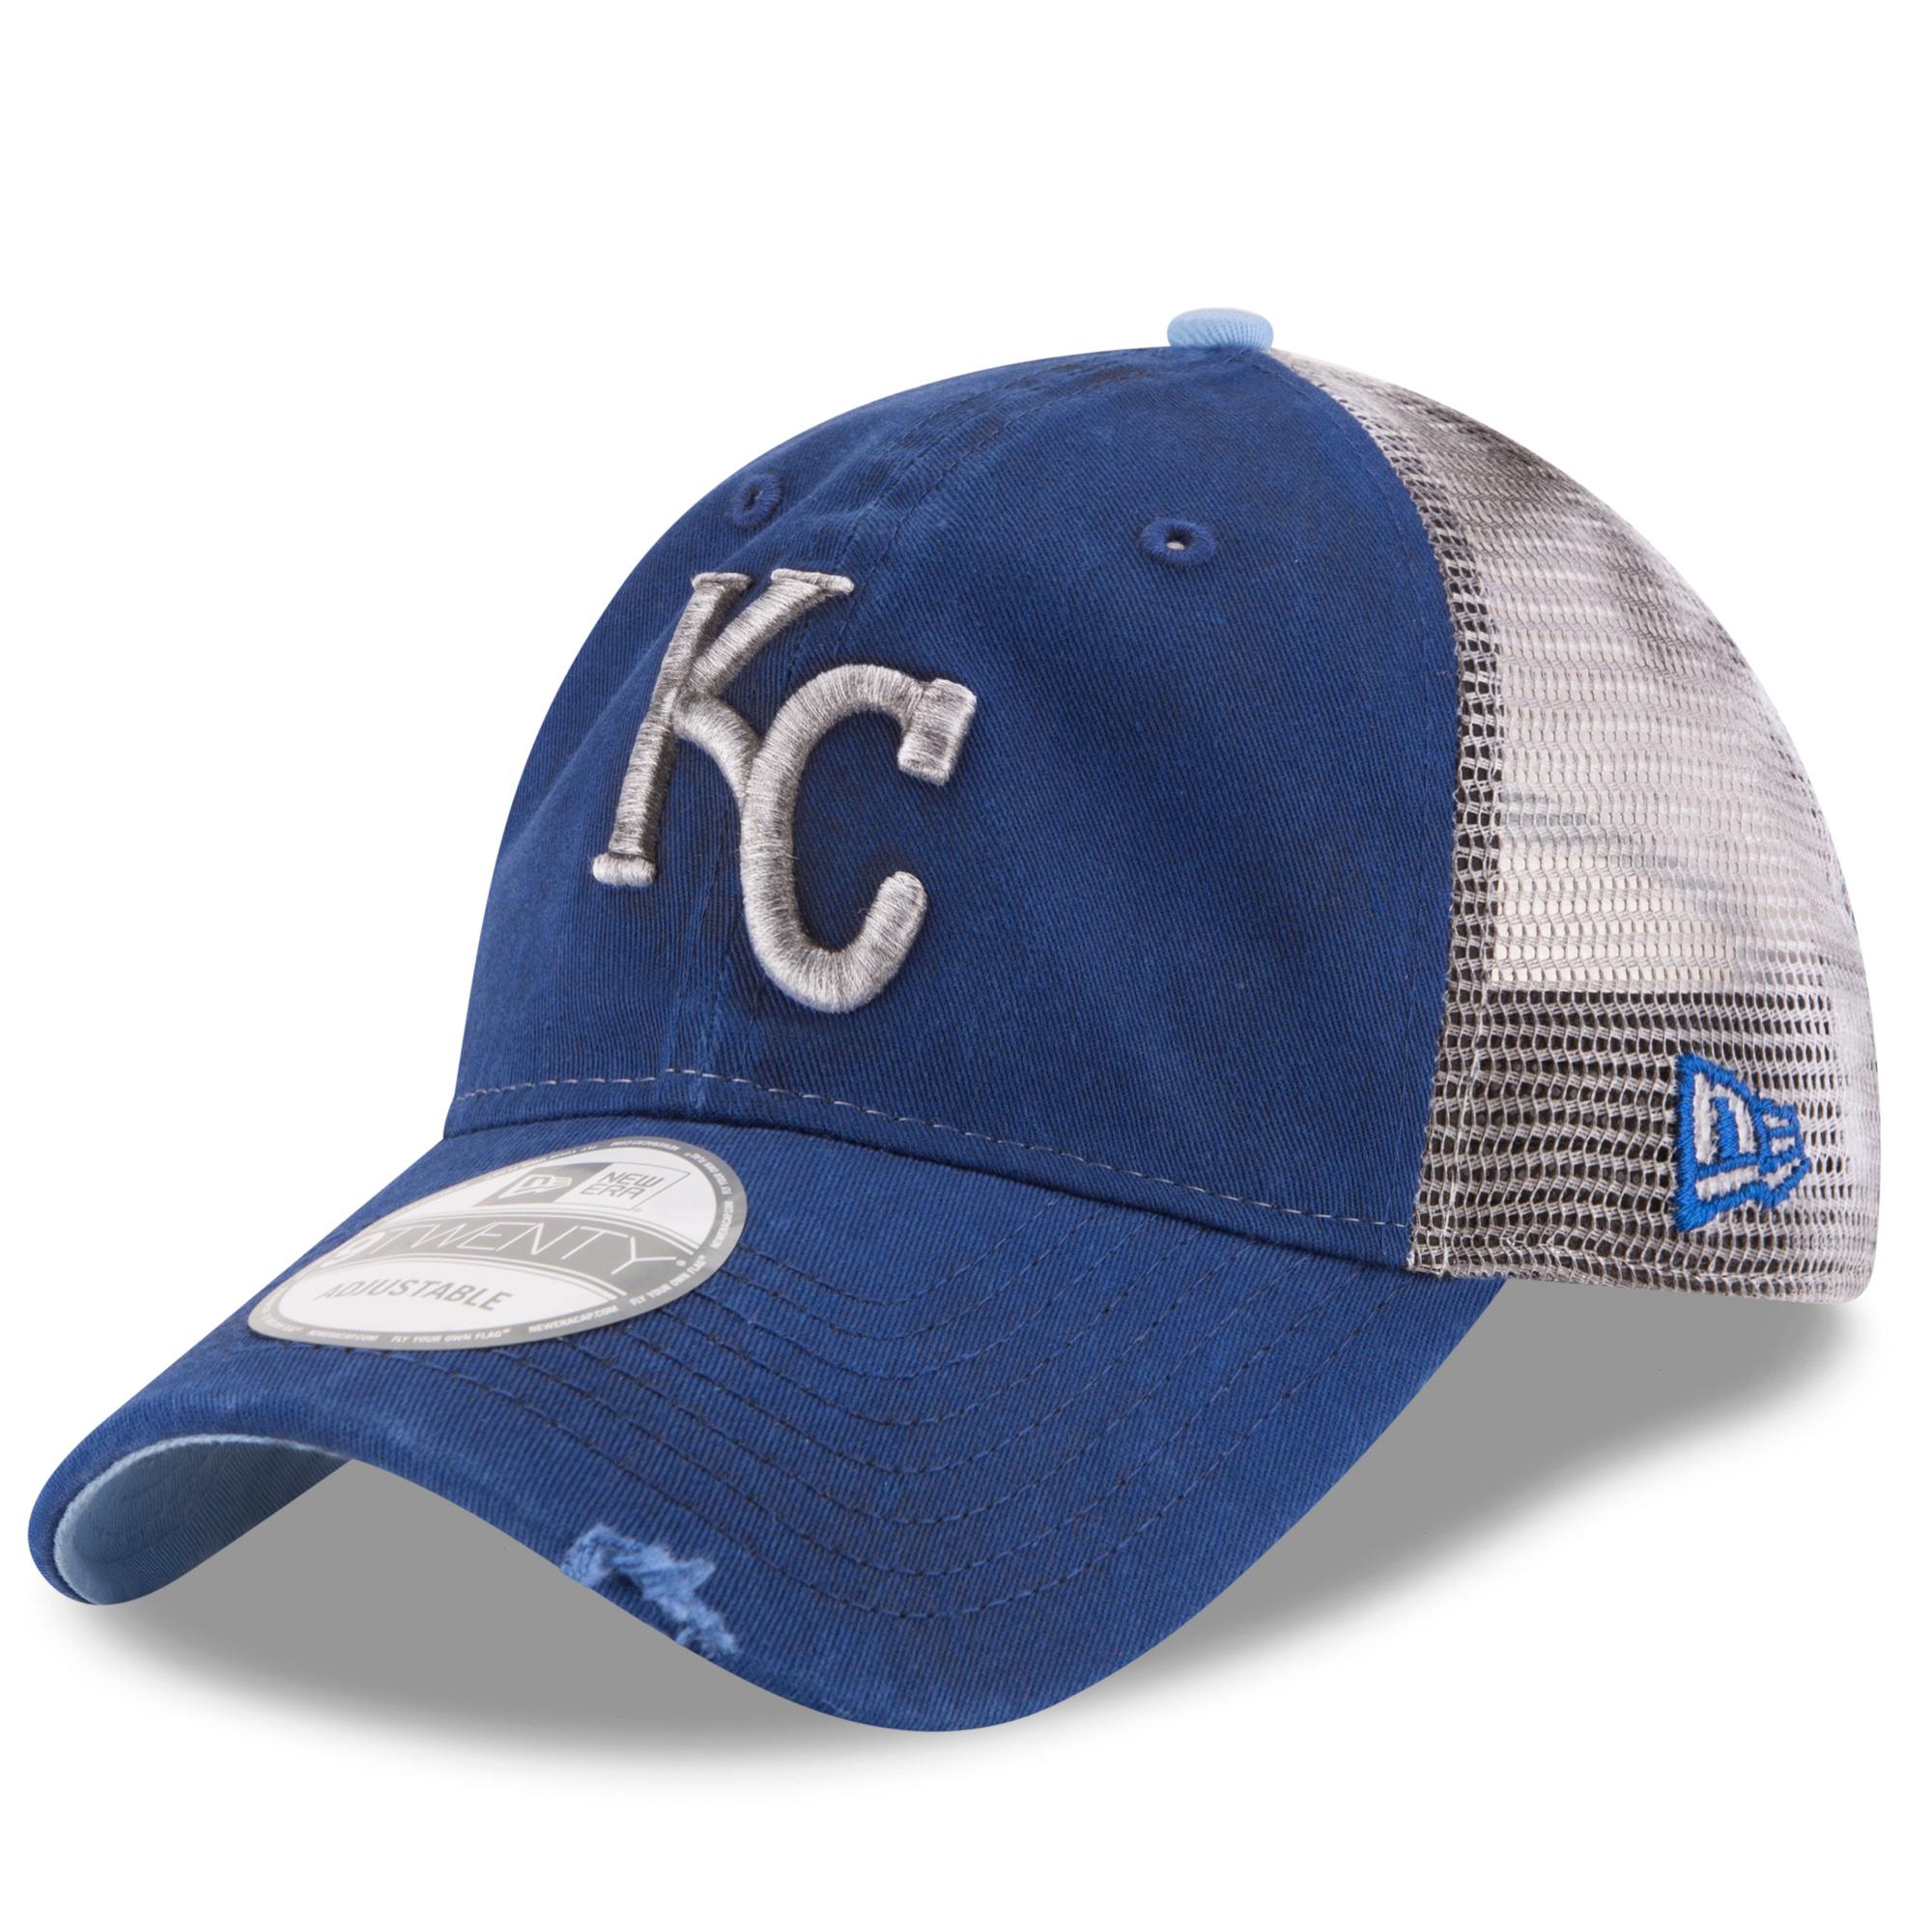 Kansas City Royals New Era Team Rustic 9TWENTY Snapback Adjustable Hat - Royal - OSFA